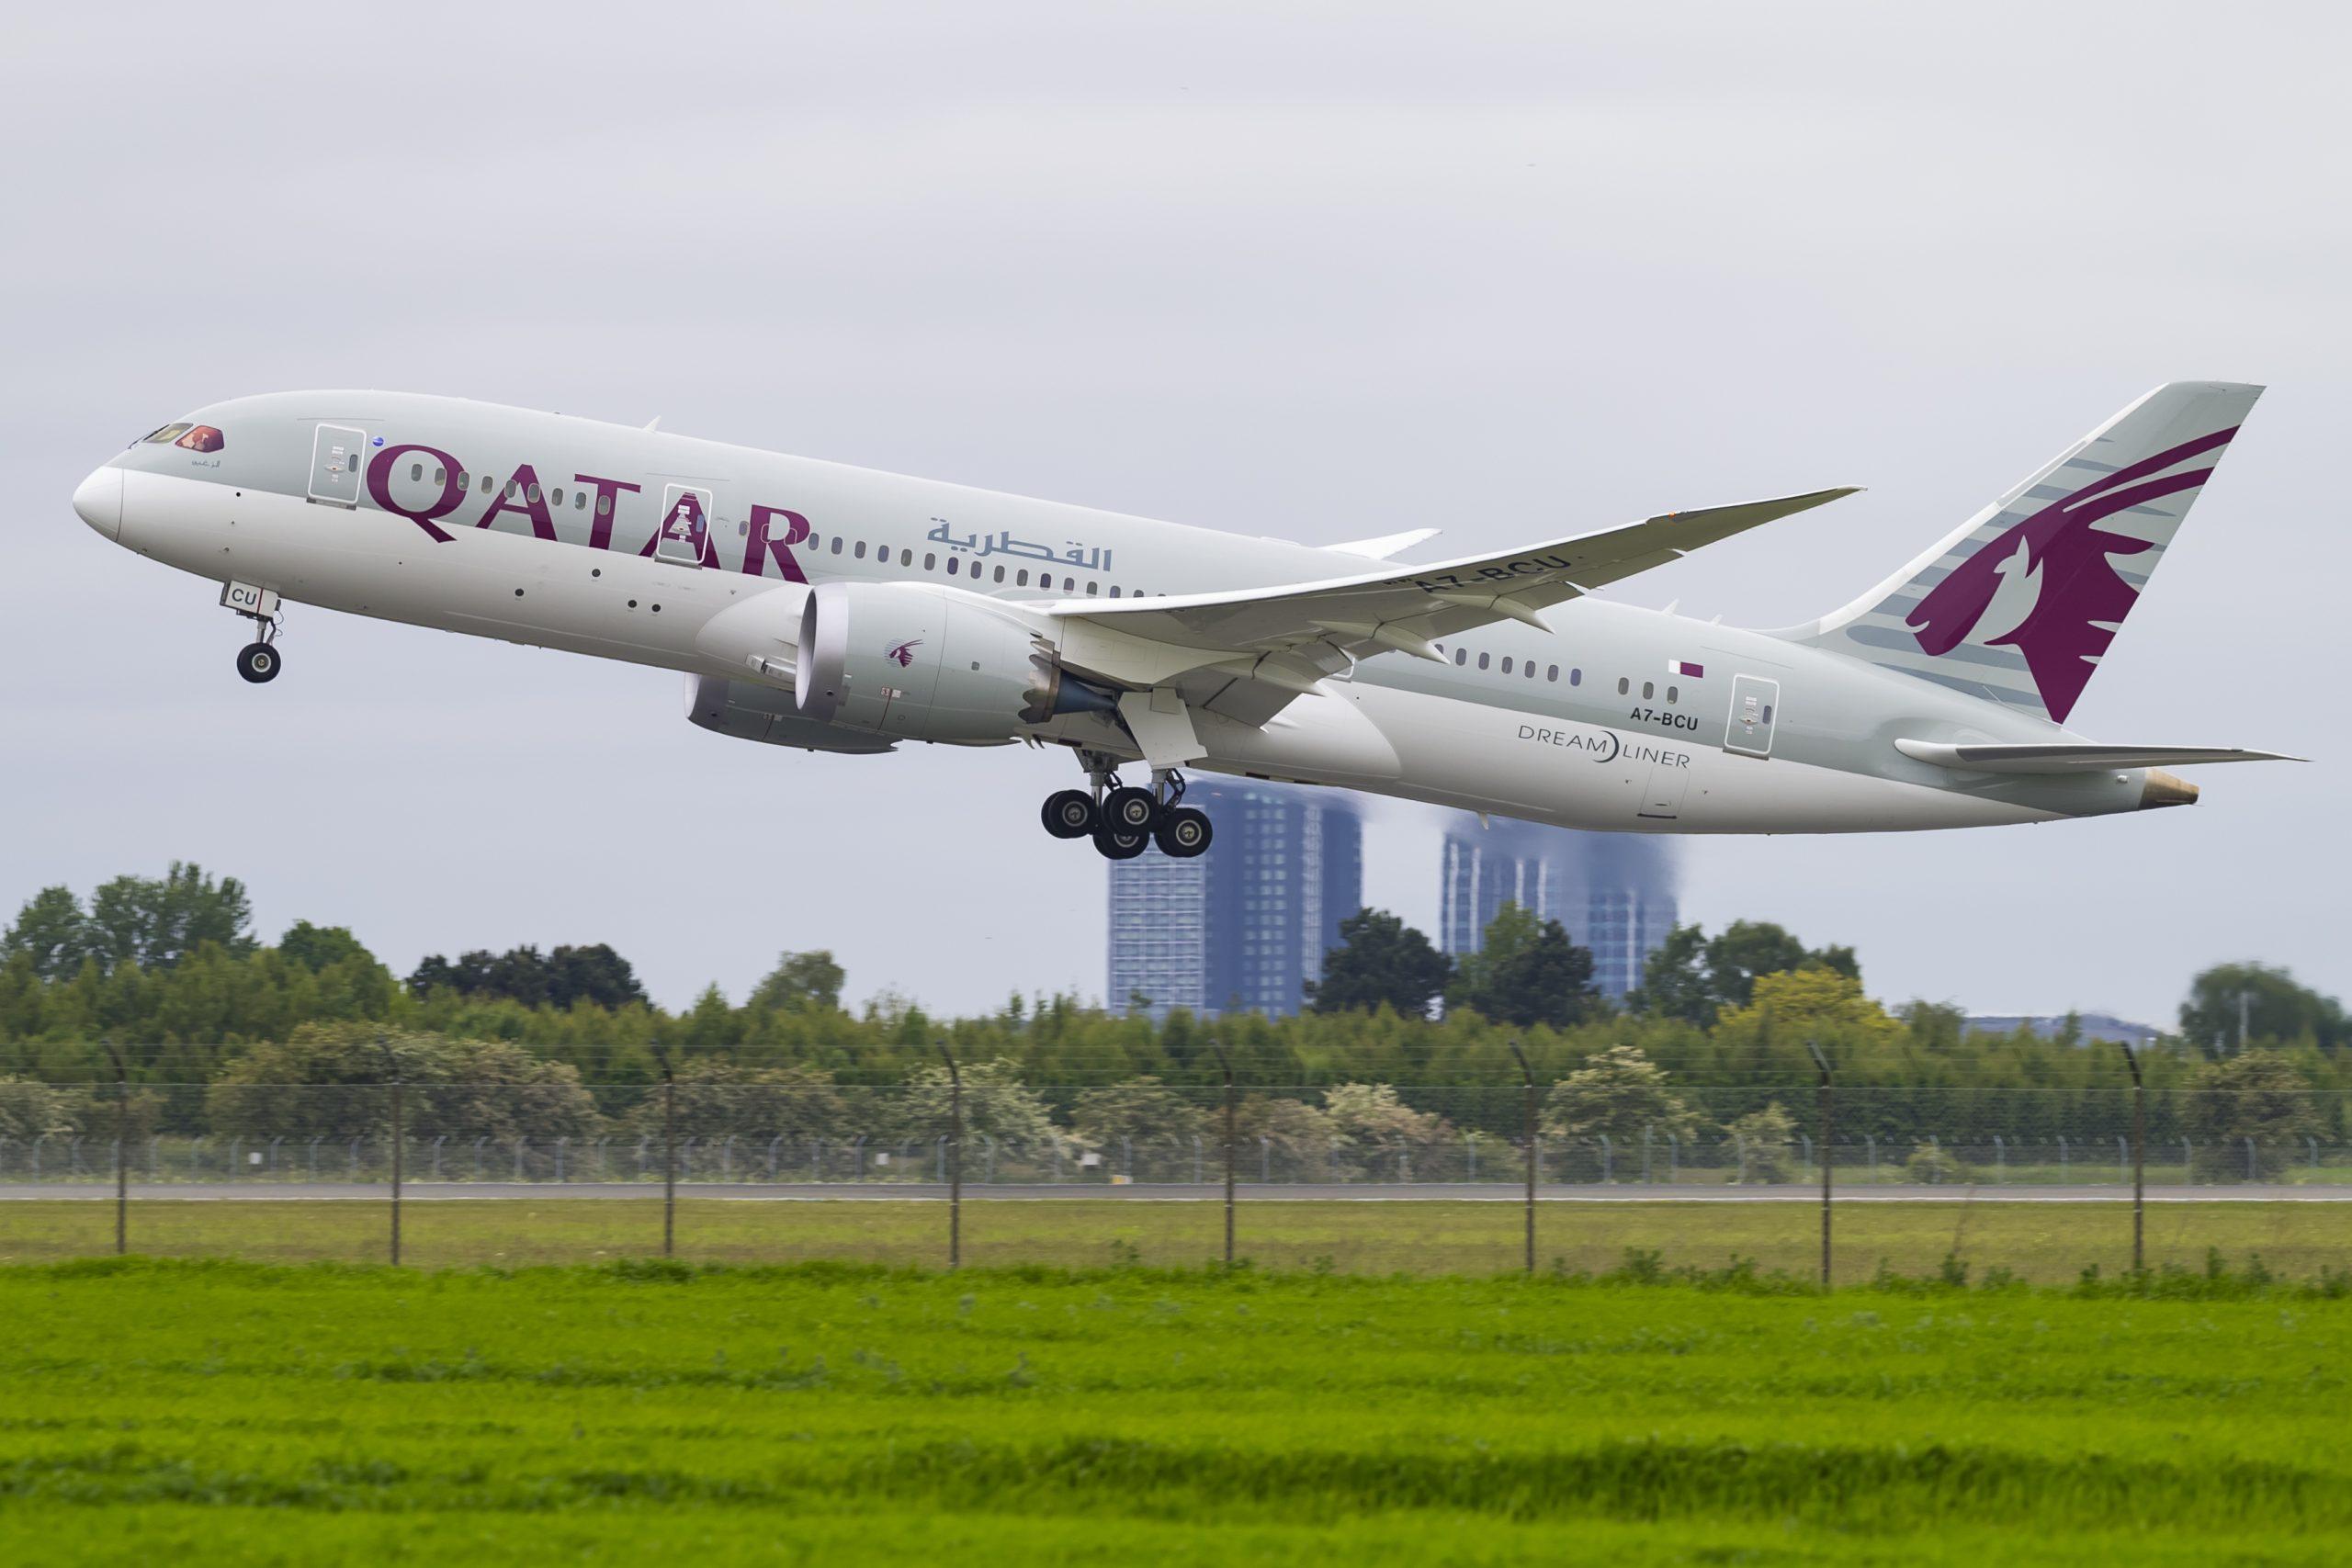 Boeing 787-8 Dreamliner fra Qatar Airways under start fra Københavns Lufthavn. (Foto: © Thorbjørn Brunander Sund, Danish Aviation Photo)